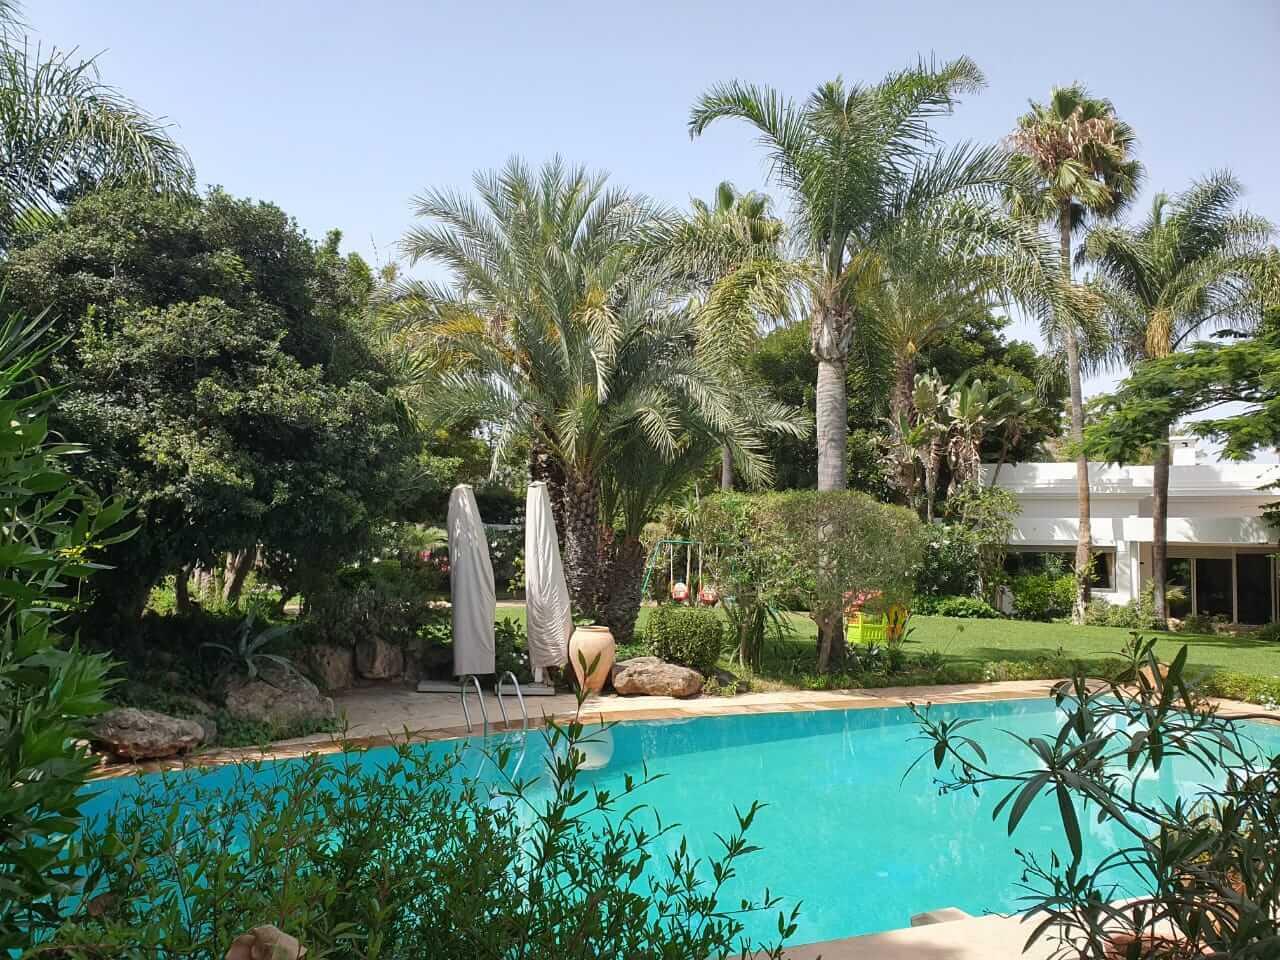 Vente Villa moderne à Rabat Souissi